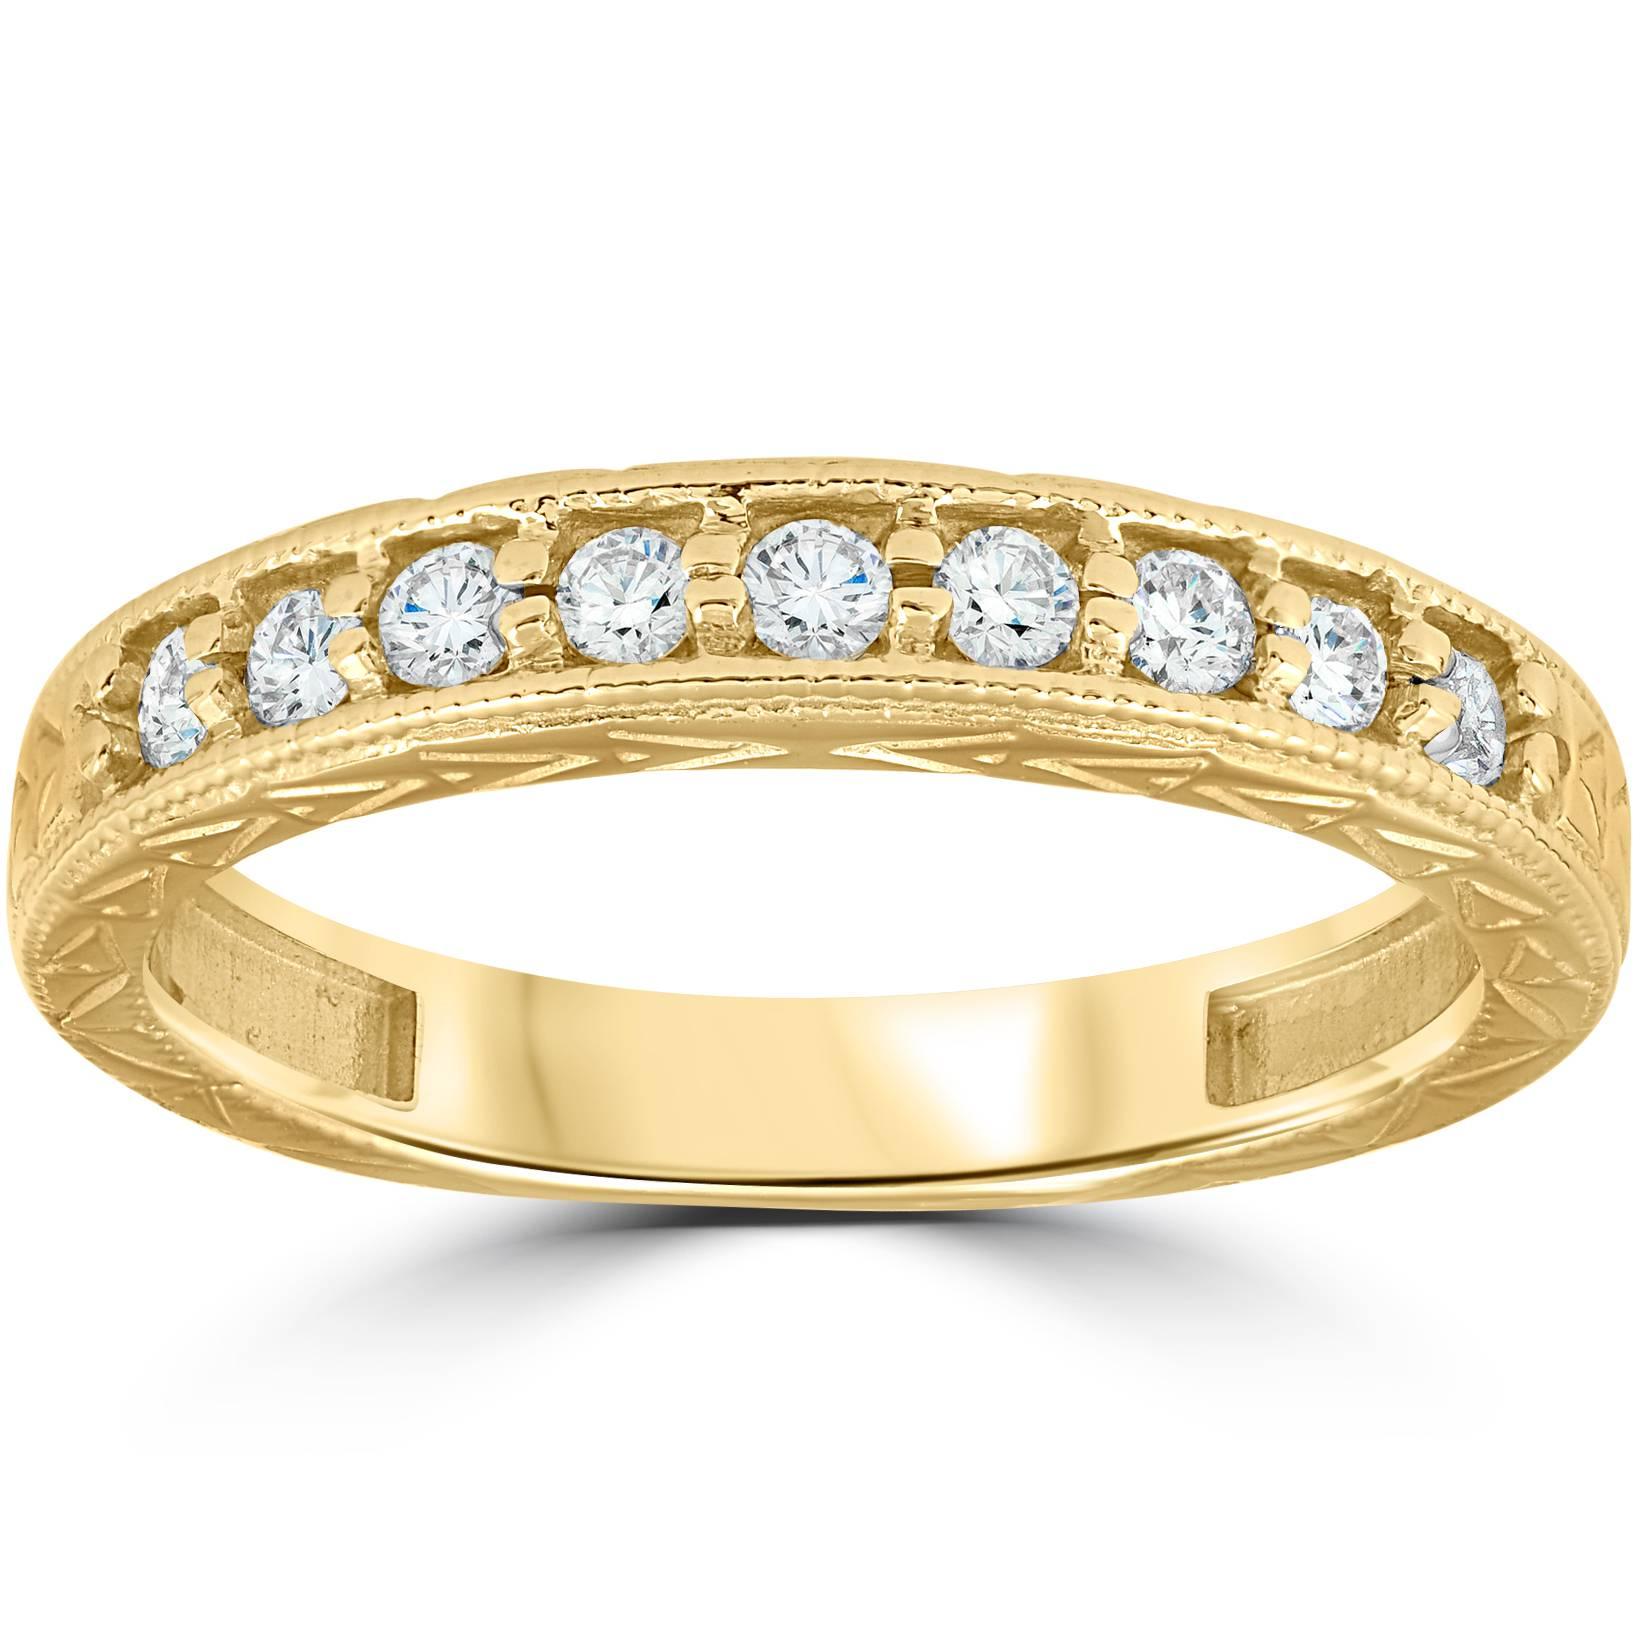 14k yellow gold 1 4ct diamond vintage anniversary wedding. Black Bedroom Furniture Sets. Home Design Ideas